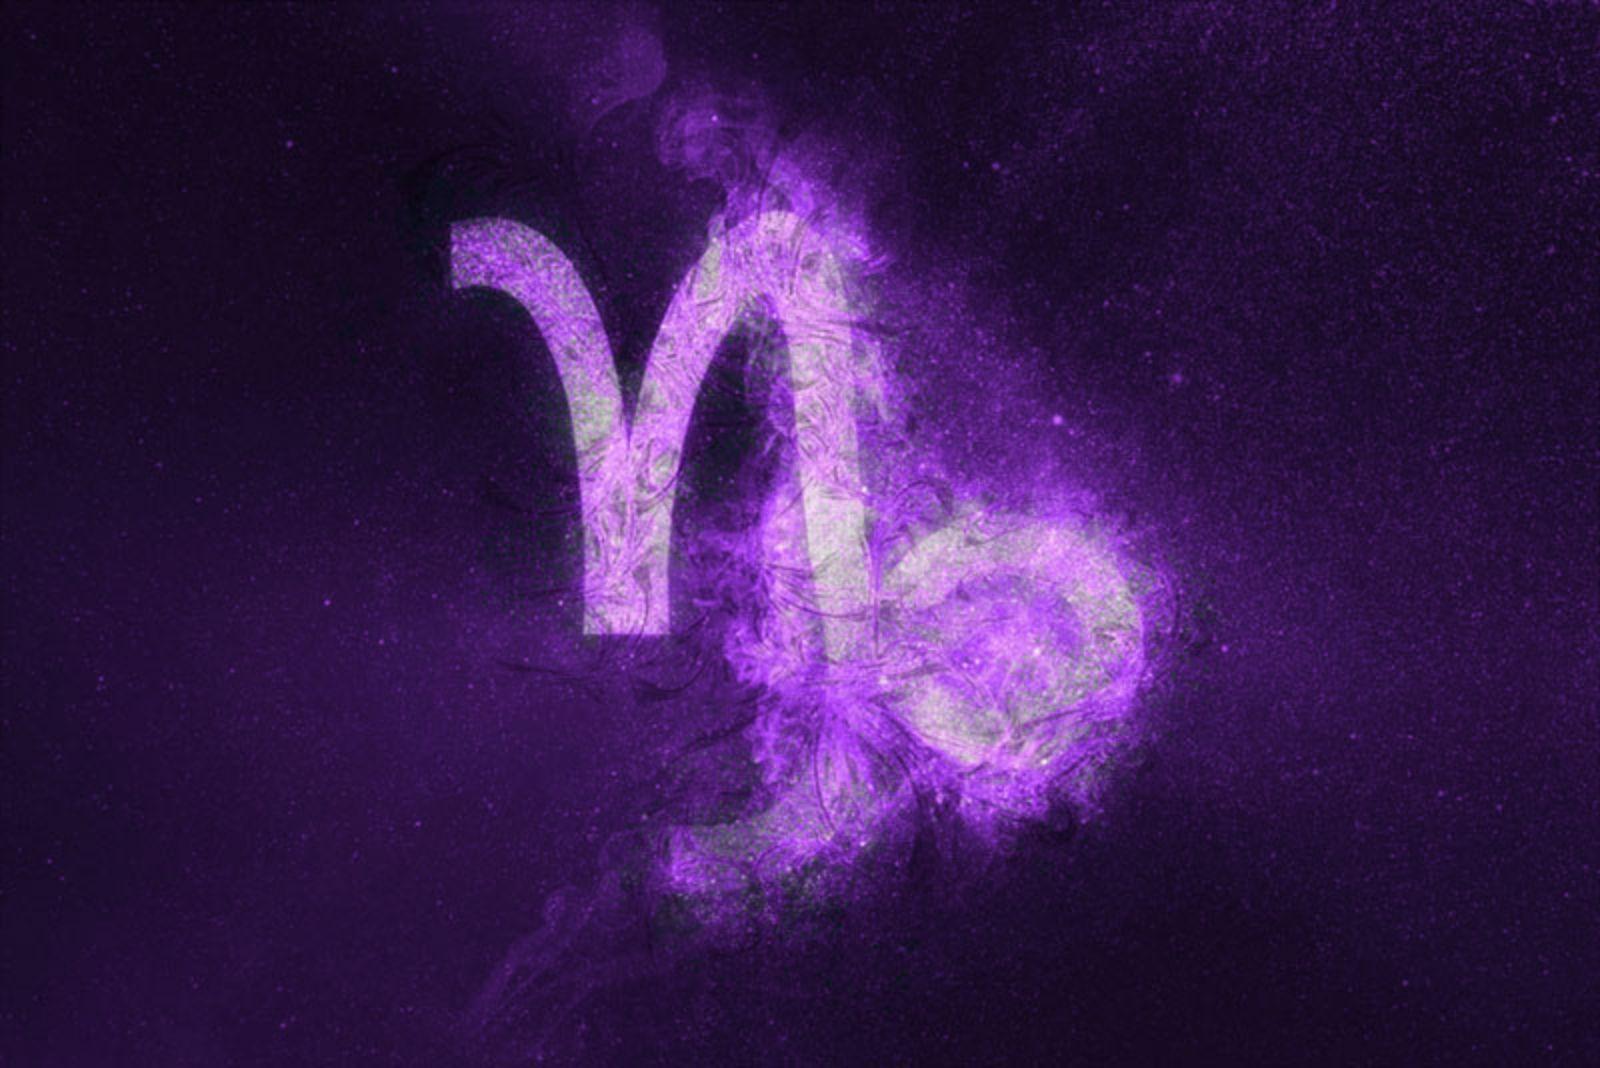 Zodiac sign of Capricorn